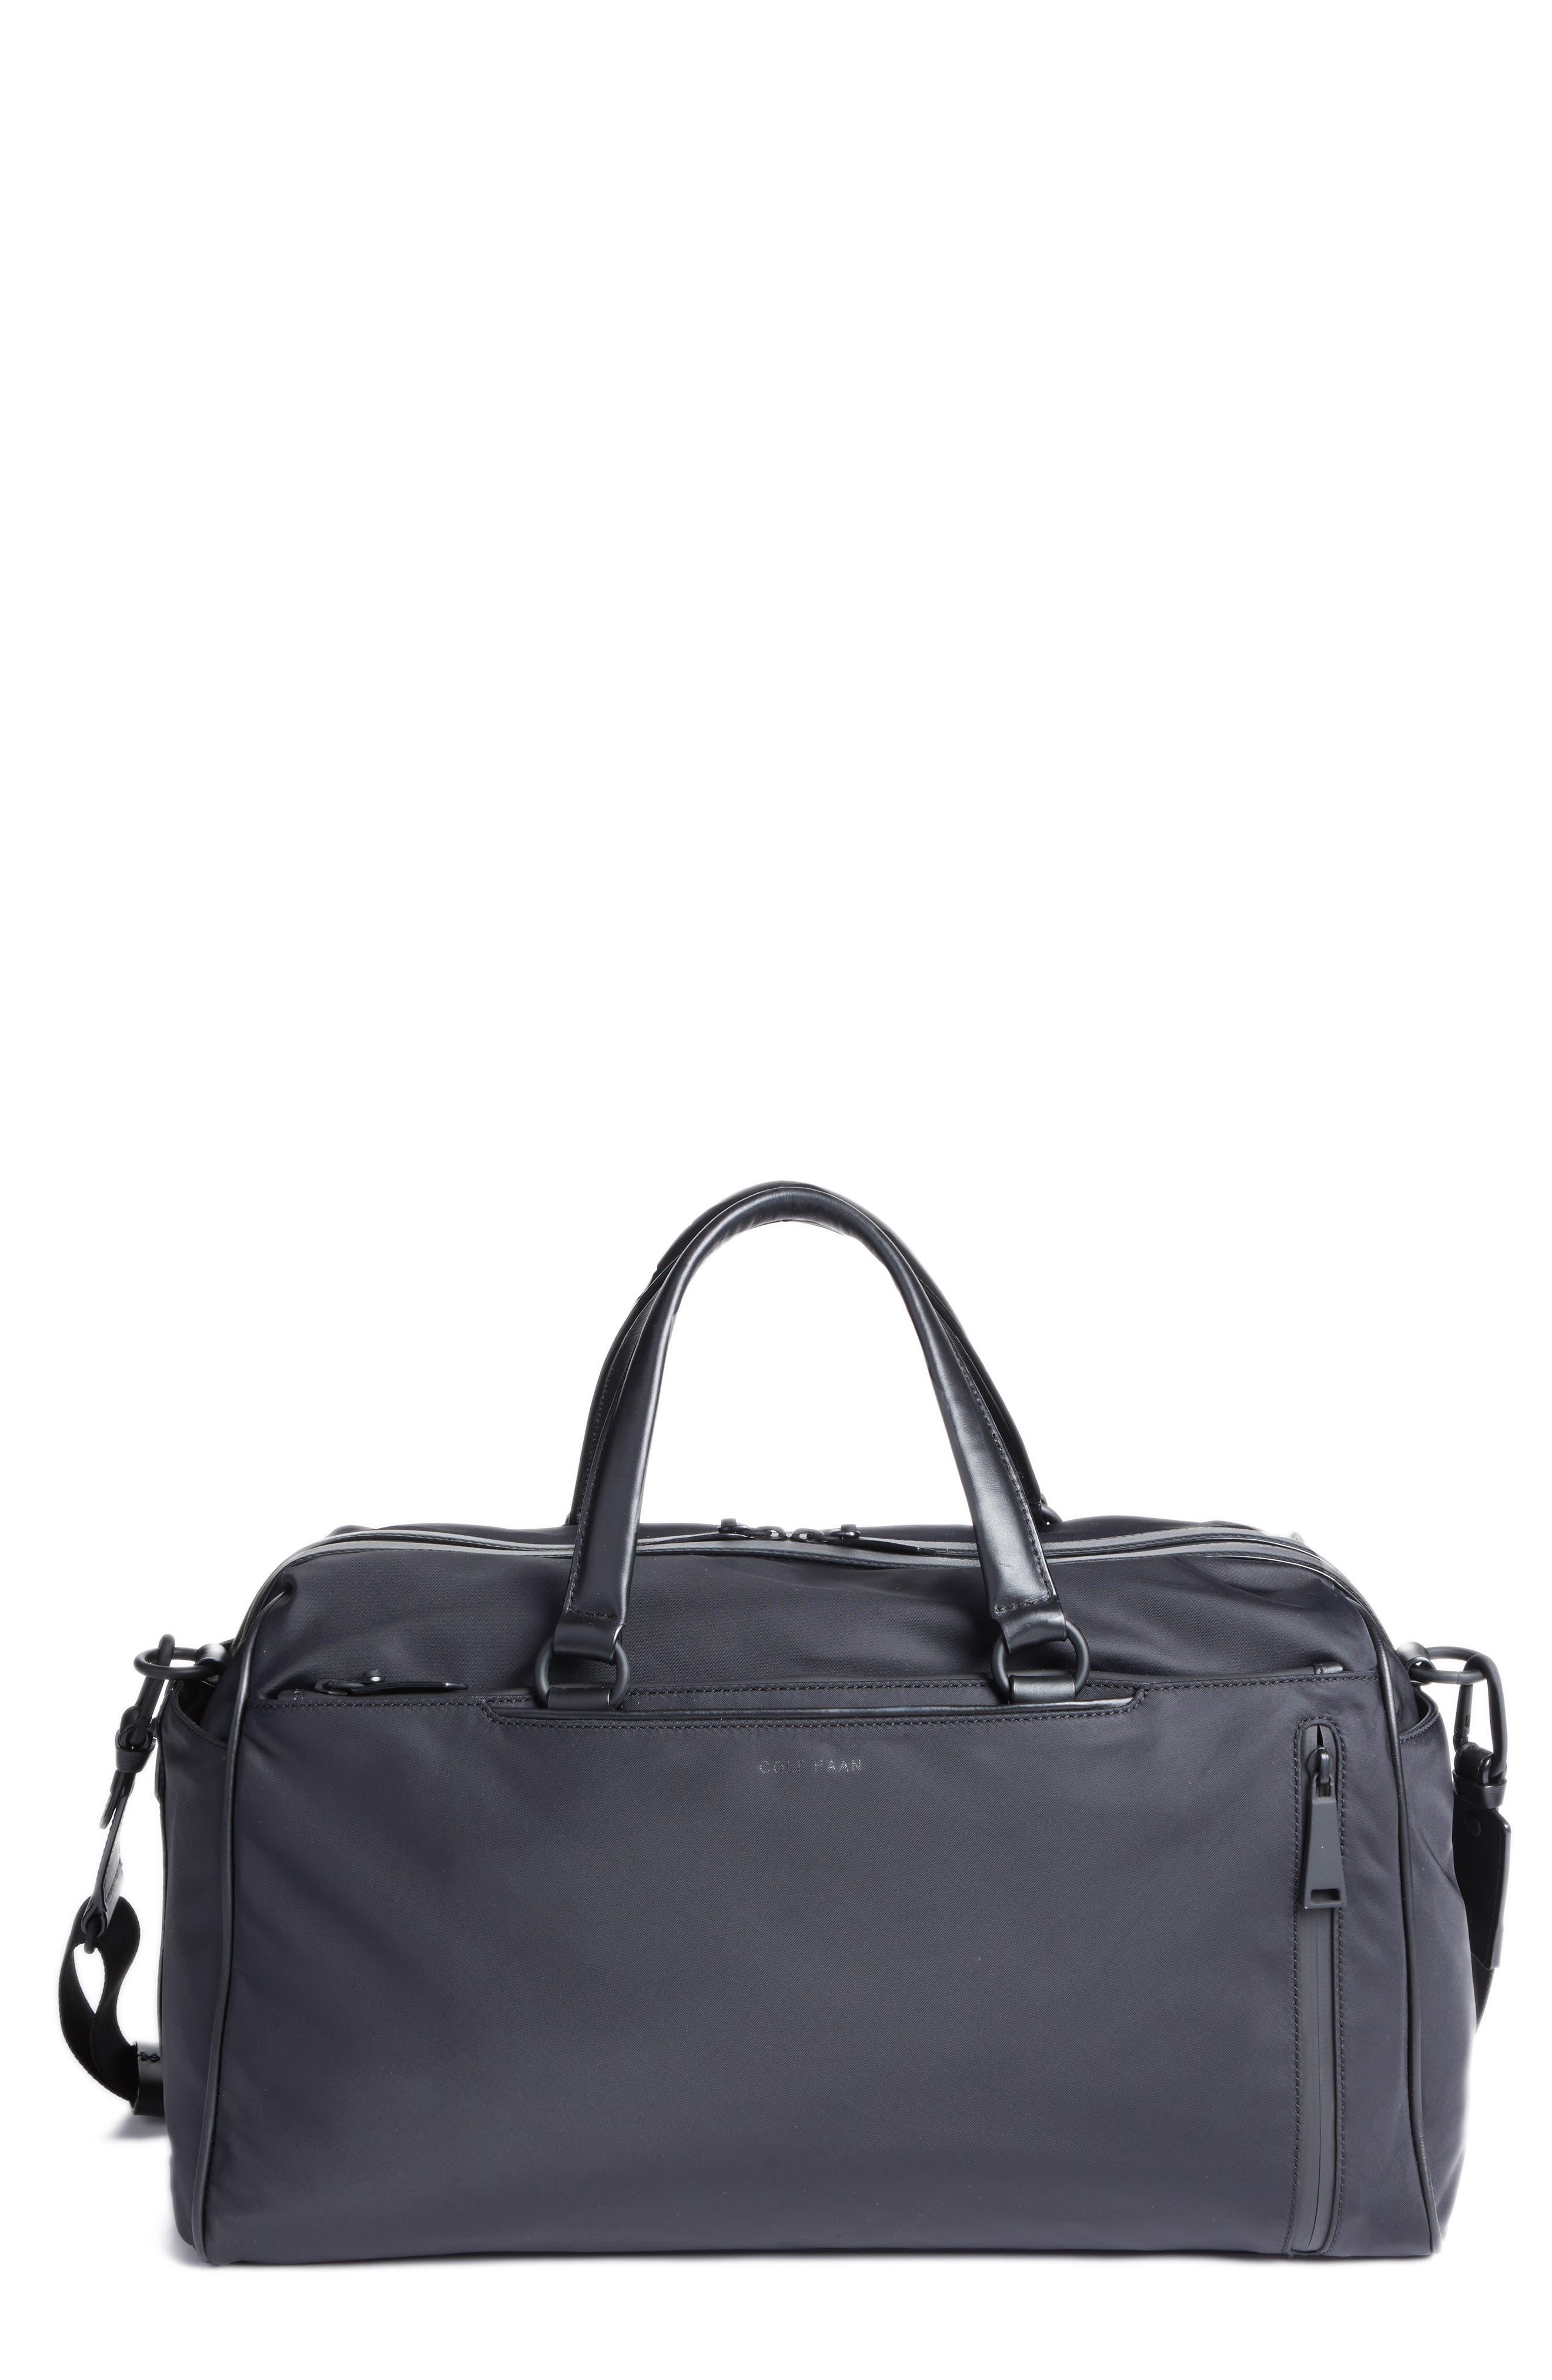 Grand Duffel Bag,                             Main thumbnail 1, color,                             001